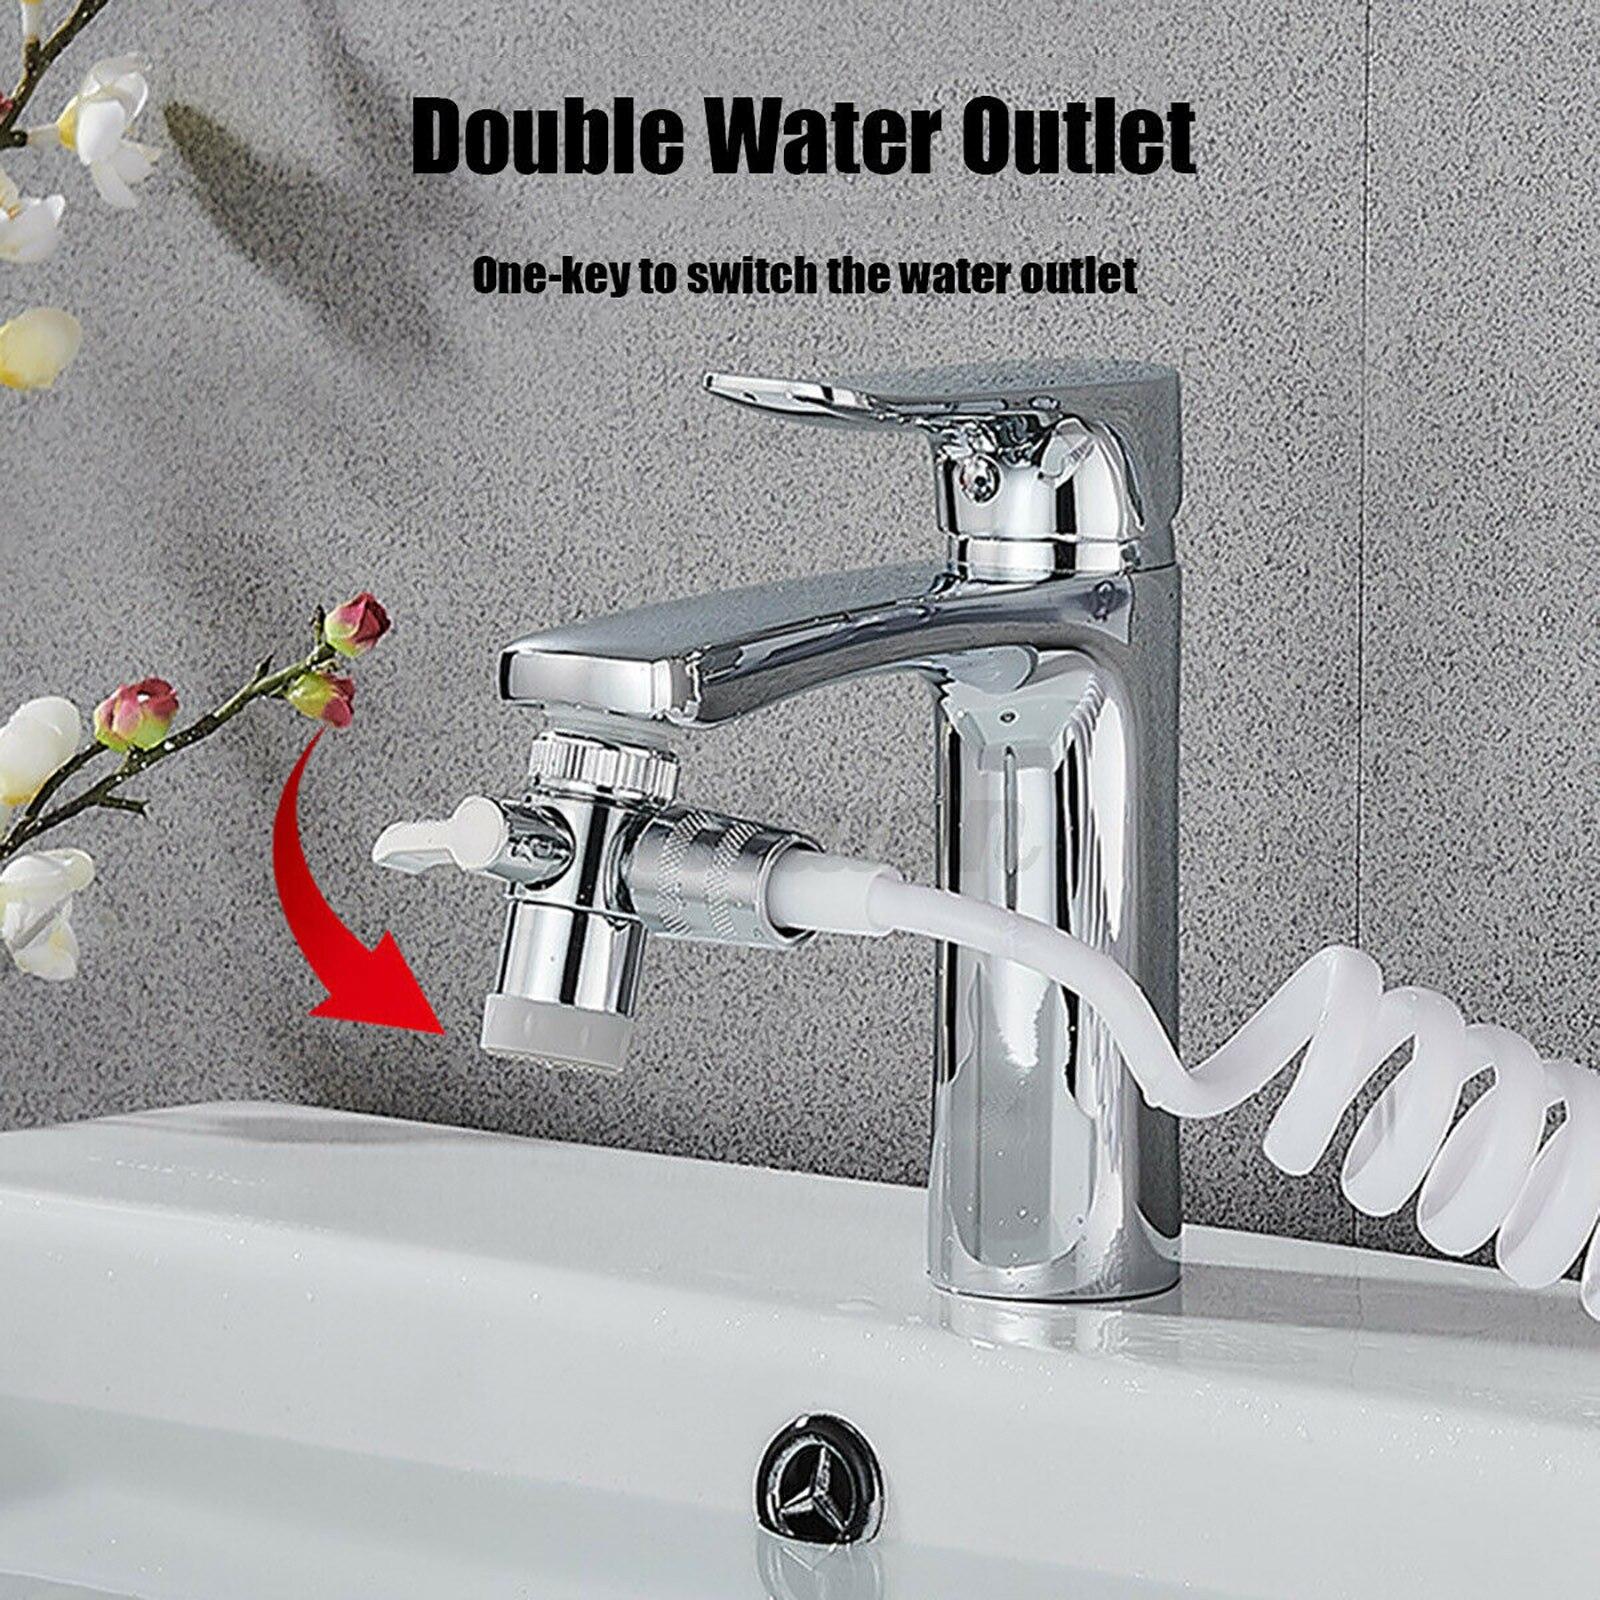 Haa73c58f6e6147d693fdc53f597053e3t Sink Tap Faucet Kitchens Shampoo Shower Heads Bathroom Spray Drain Filter Hose For Household Bathroom Accessories